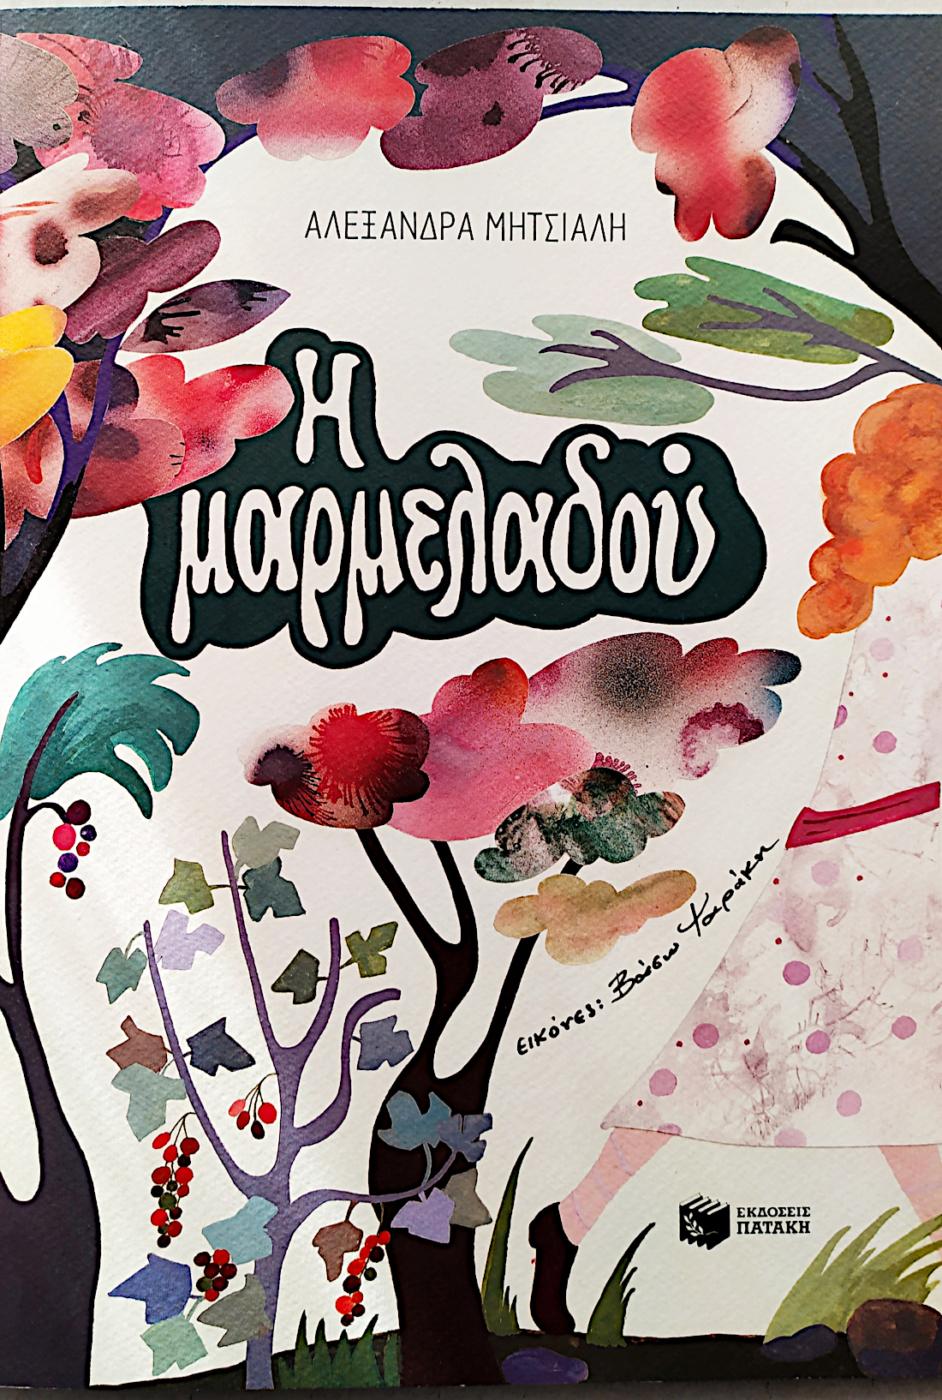 Miss-tasty-marmeladou-alexandra-mhtsialh-1